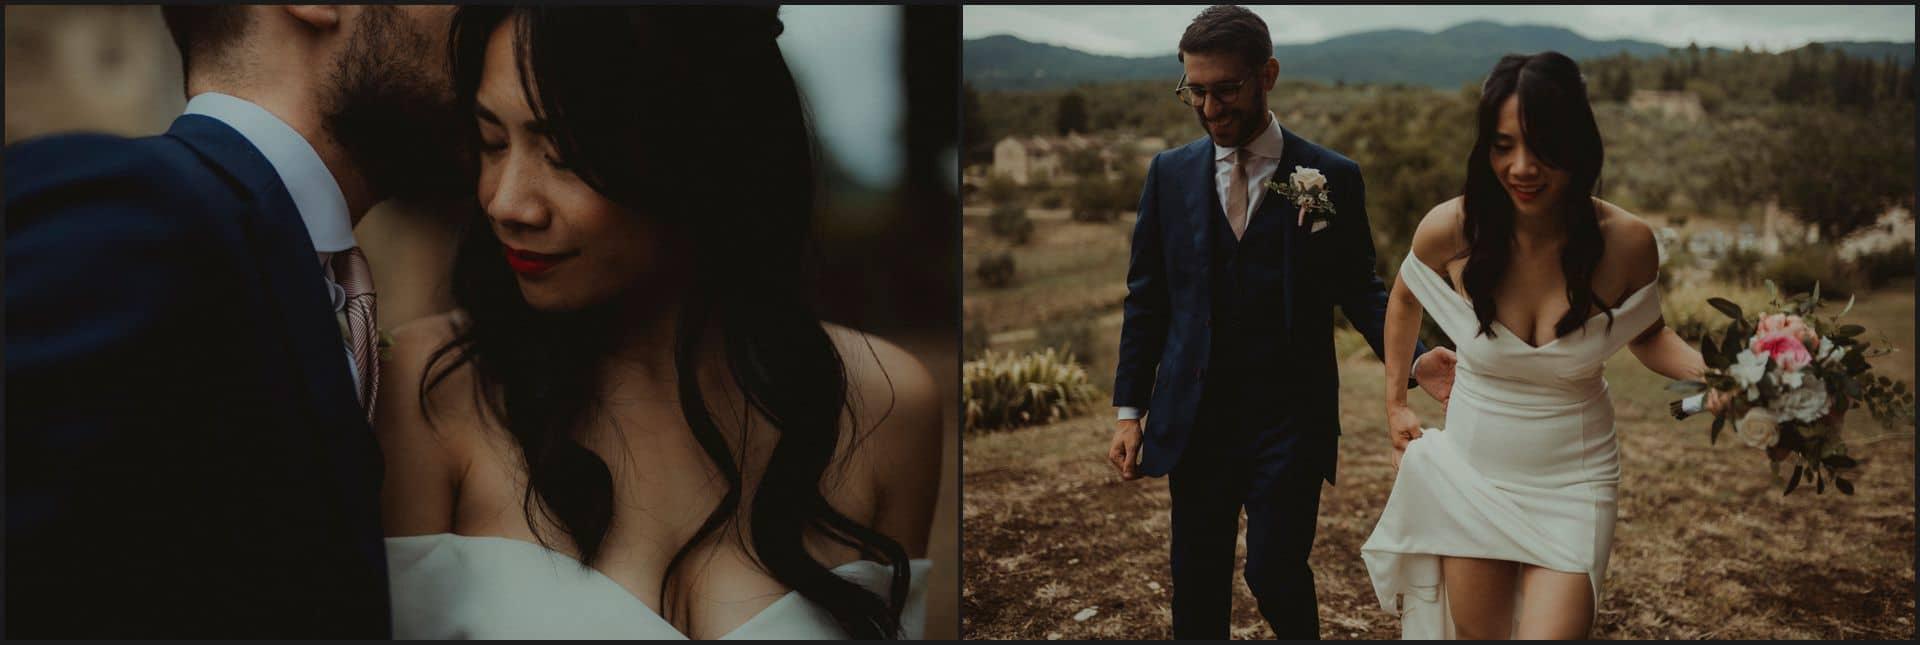 destination wedding, castello del trebbio, tuscany, bride, groom